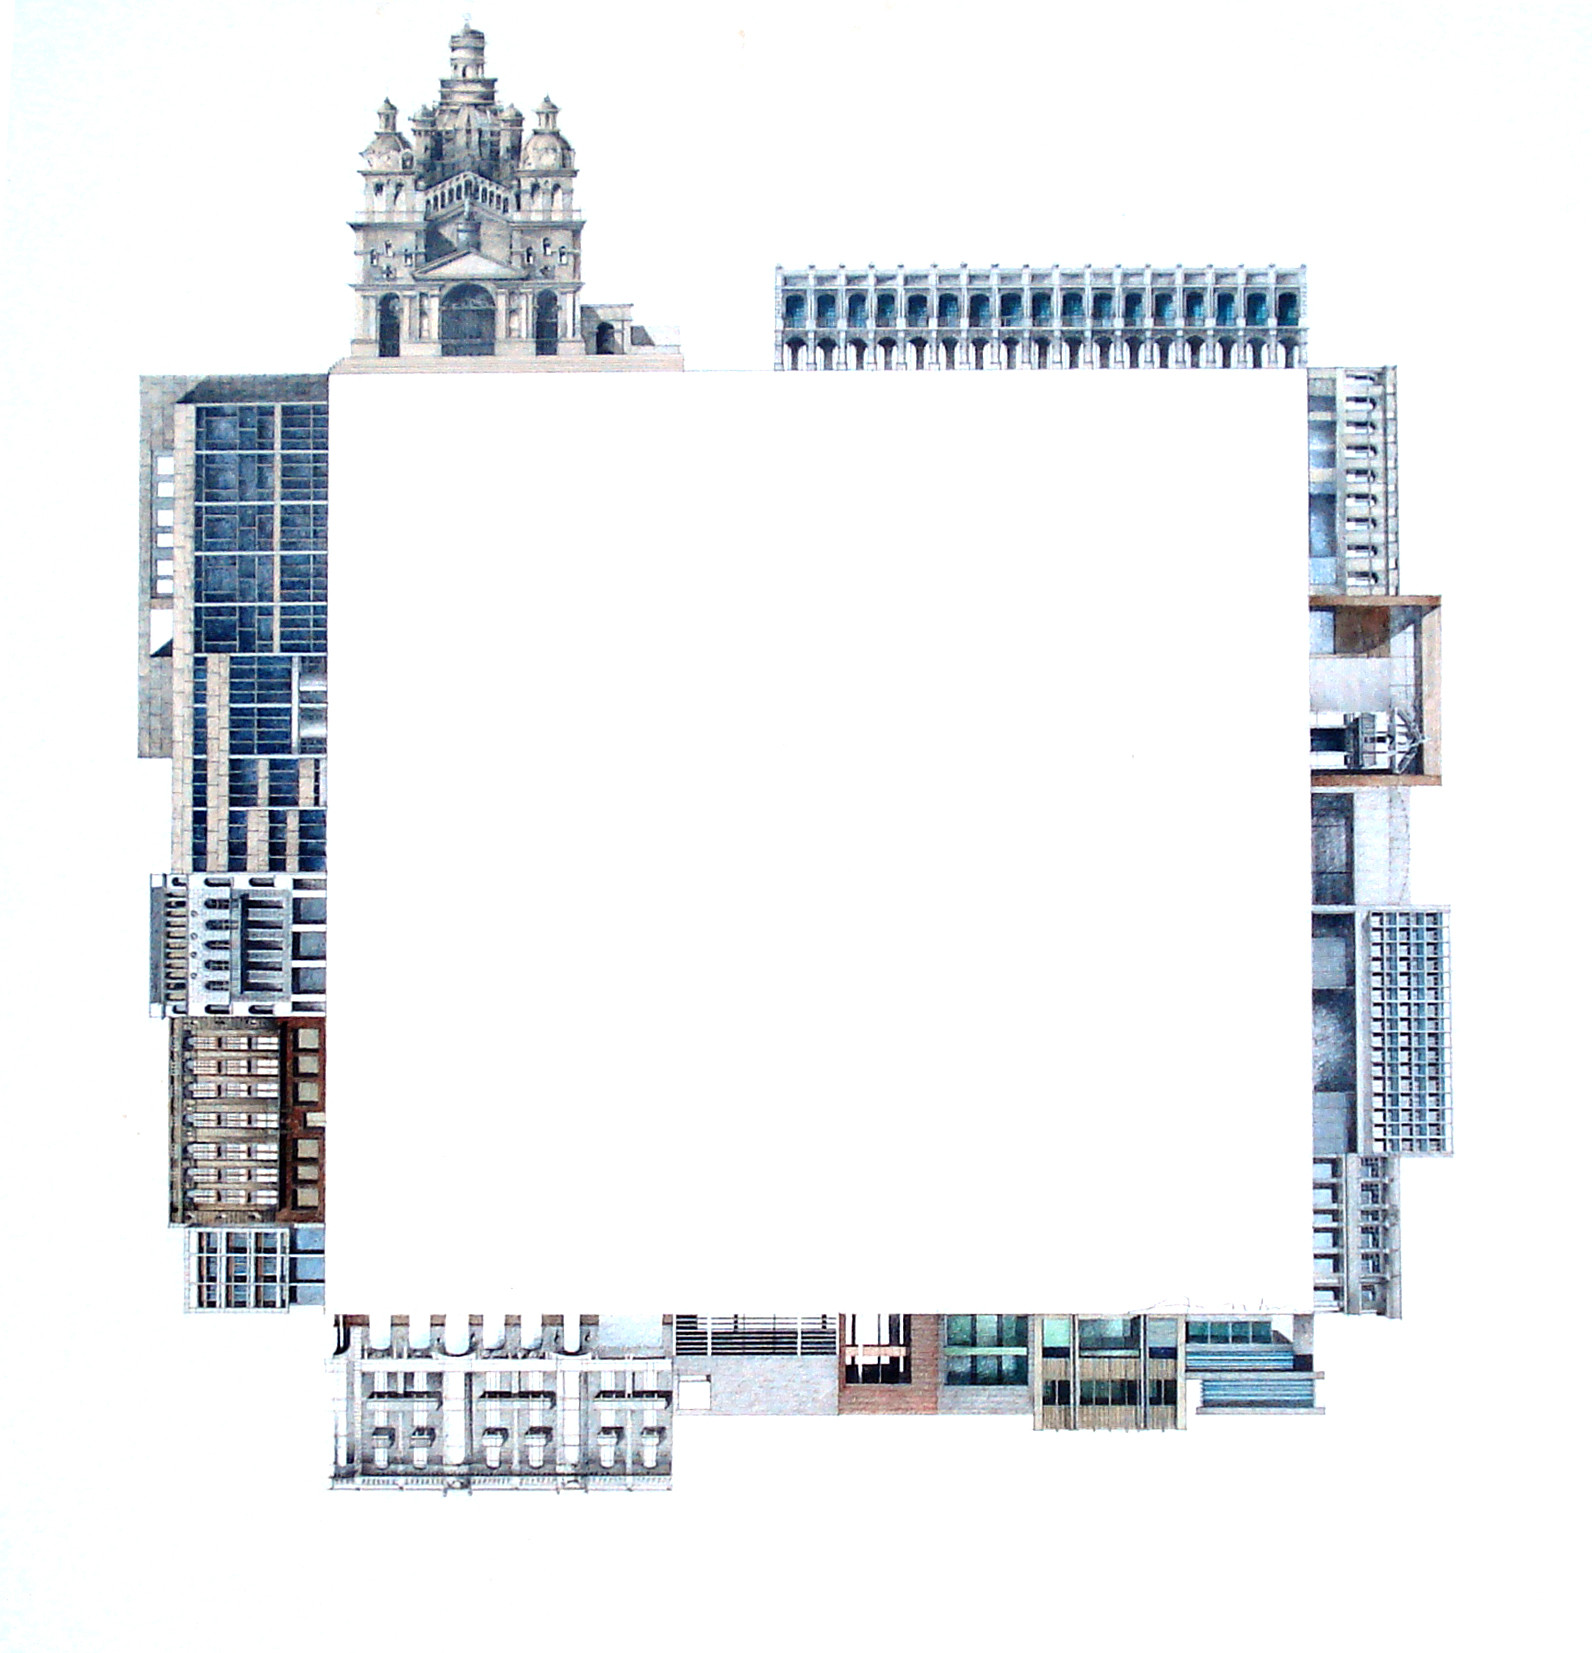 Dibujos de Viajes por el arquitecto argentino Ian Dutari , Cortesia de Ian Dutari